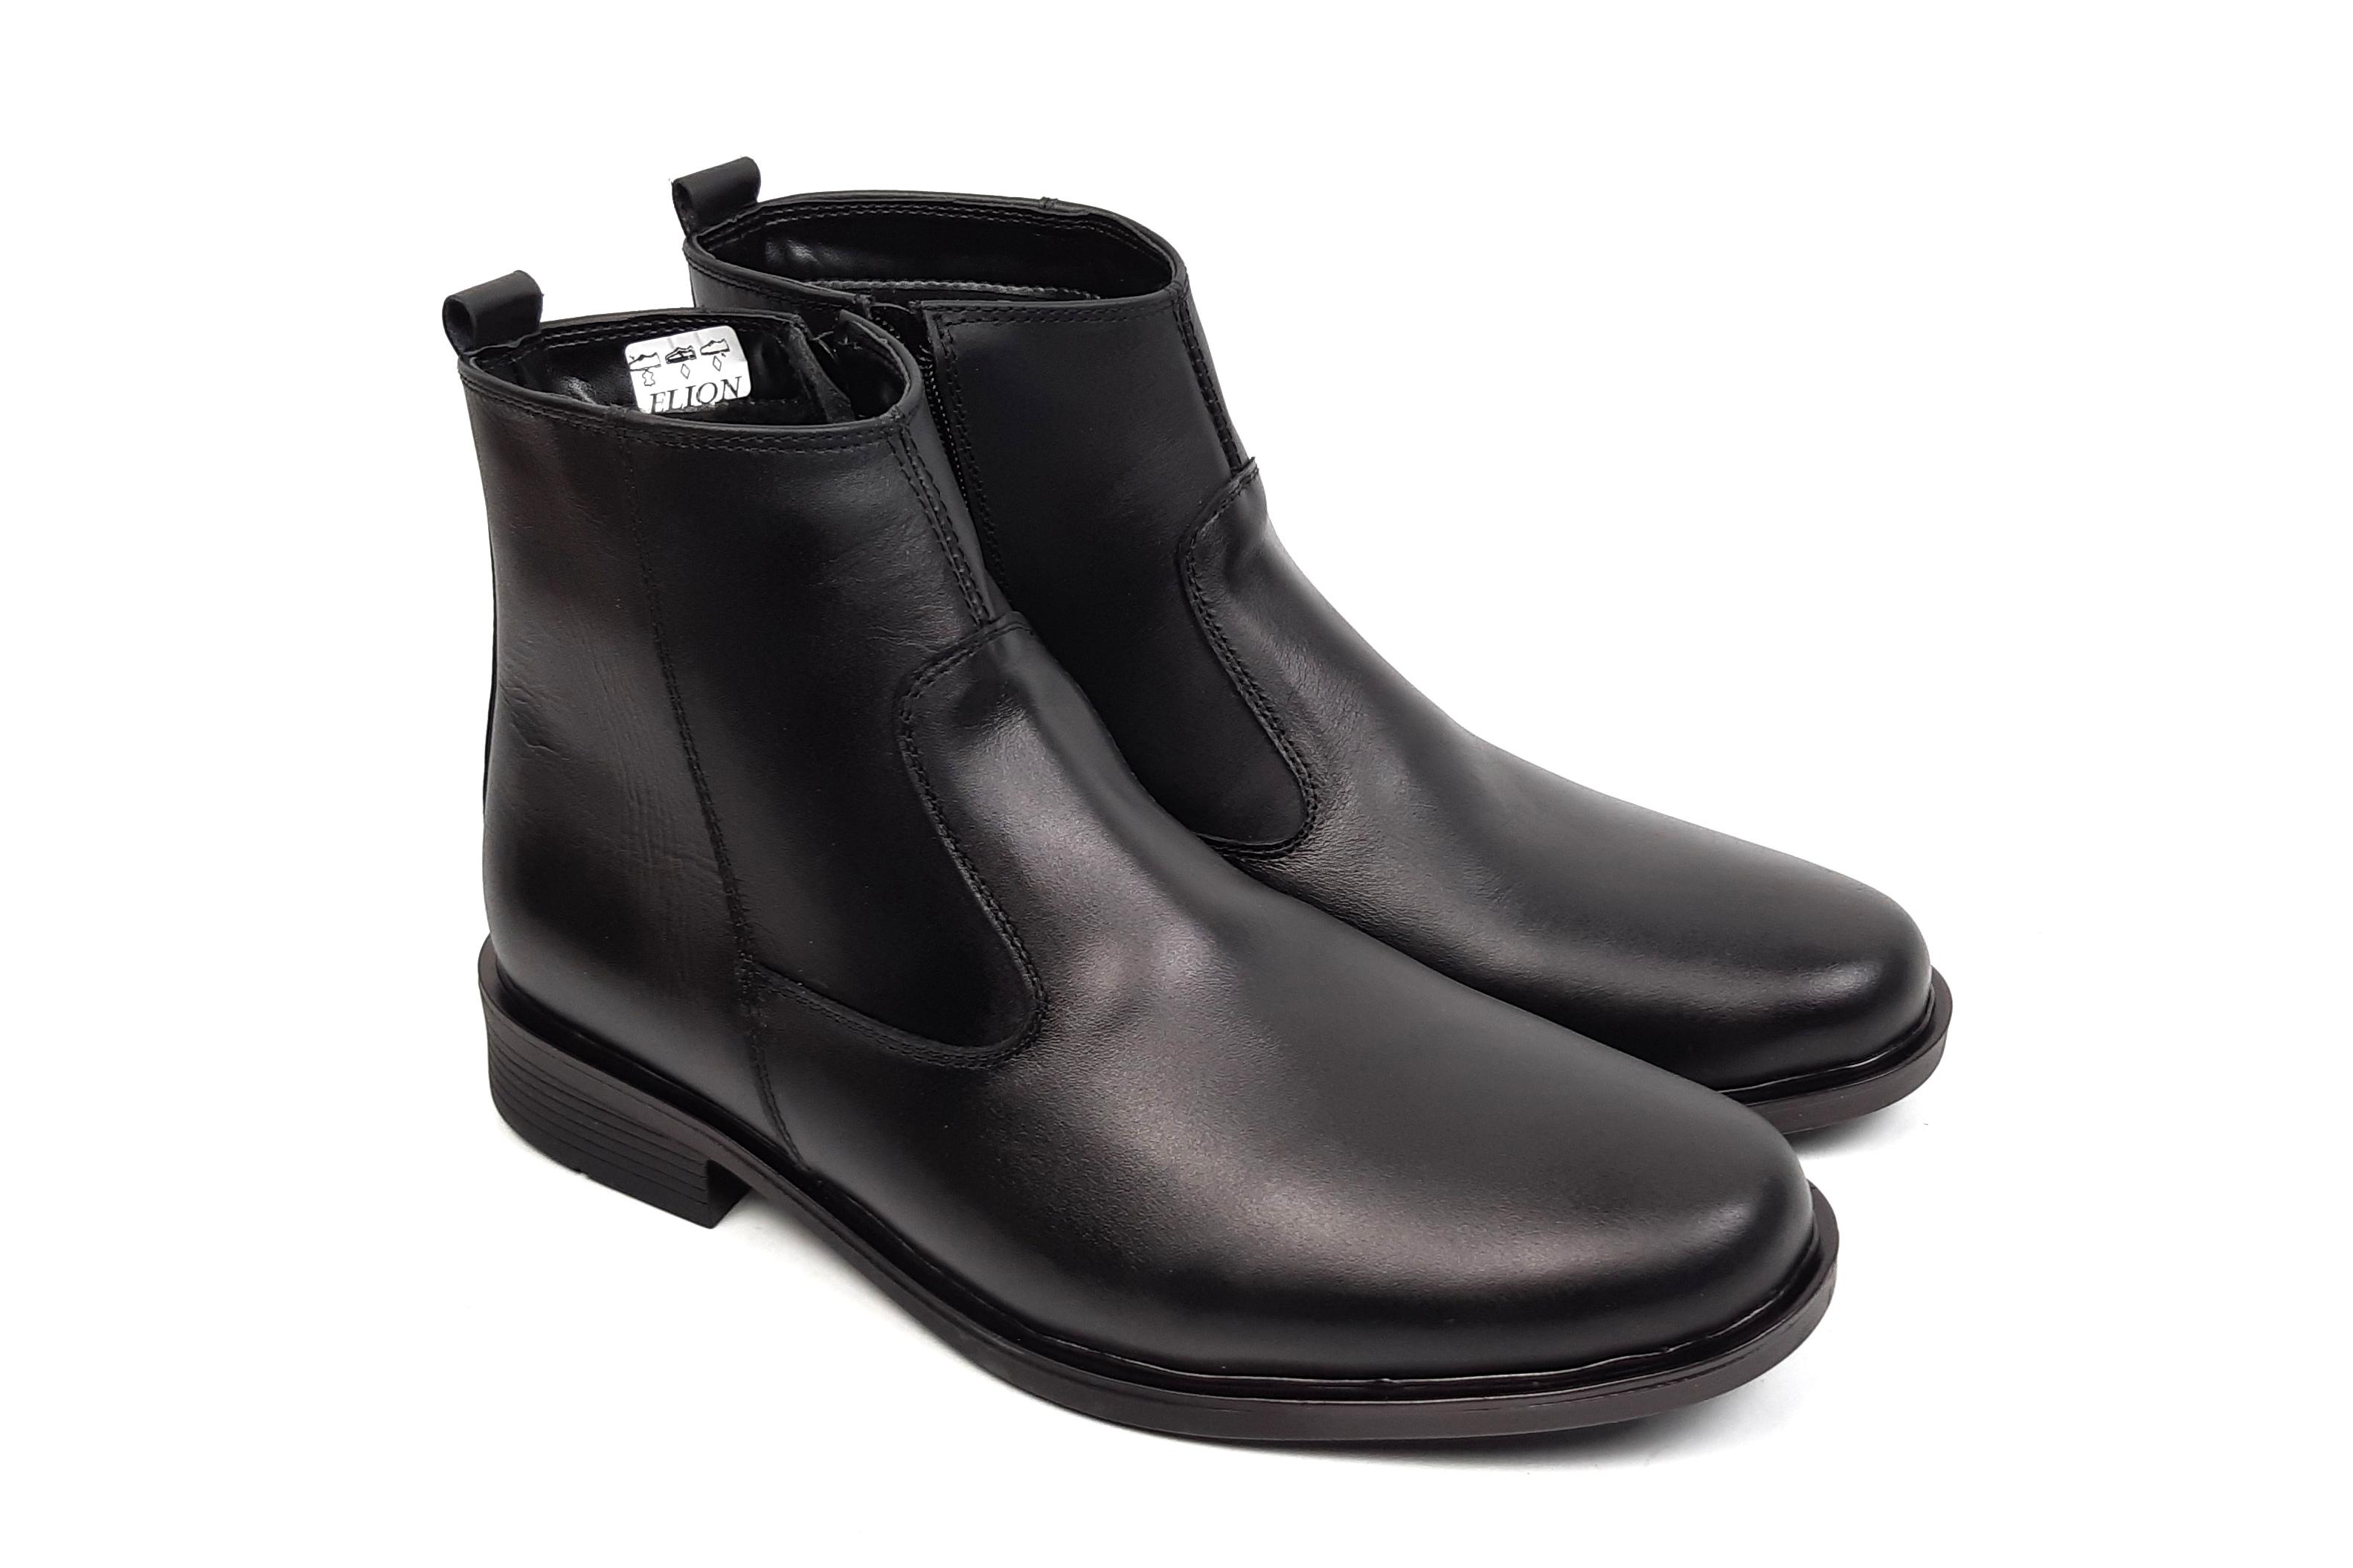 Ghete barbati casual negre - elegante, din piele naturala, cu fermoar - LYON31N